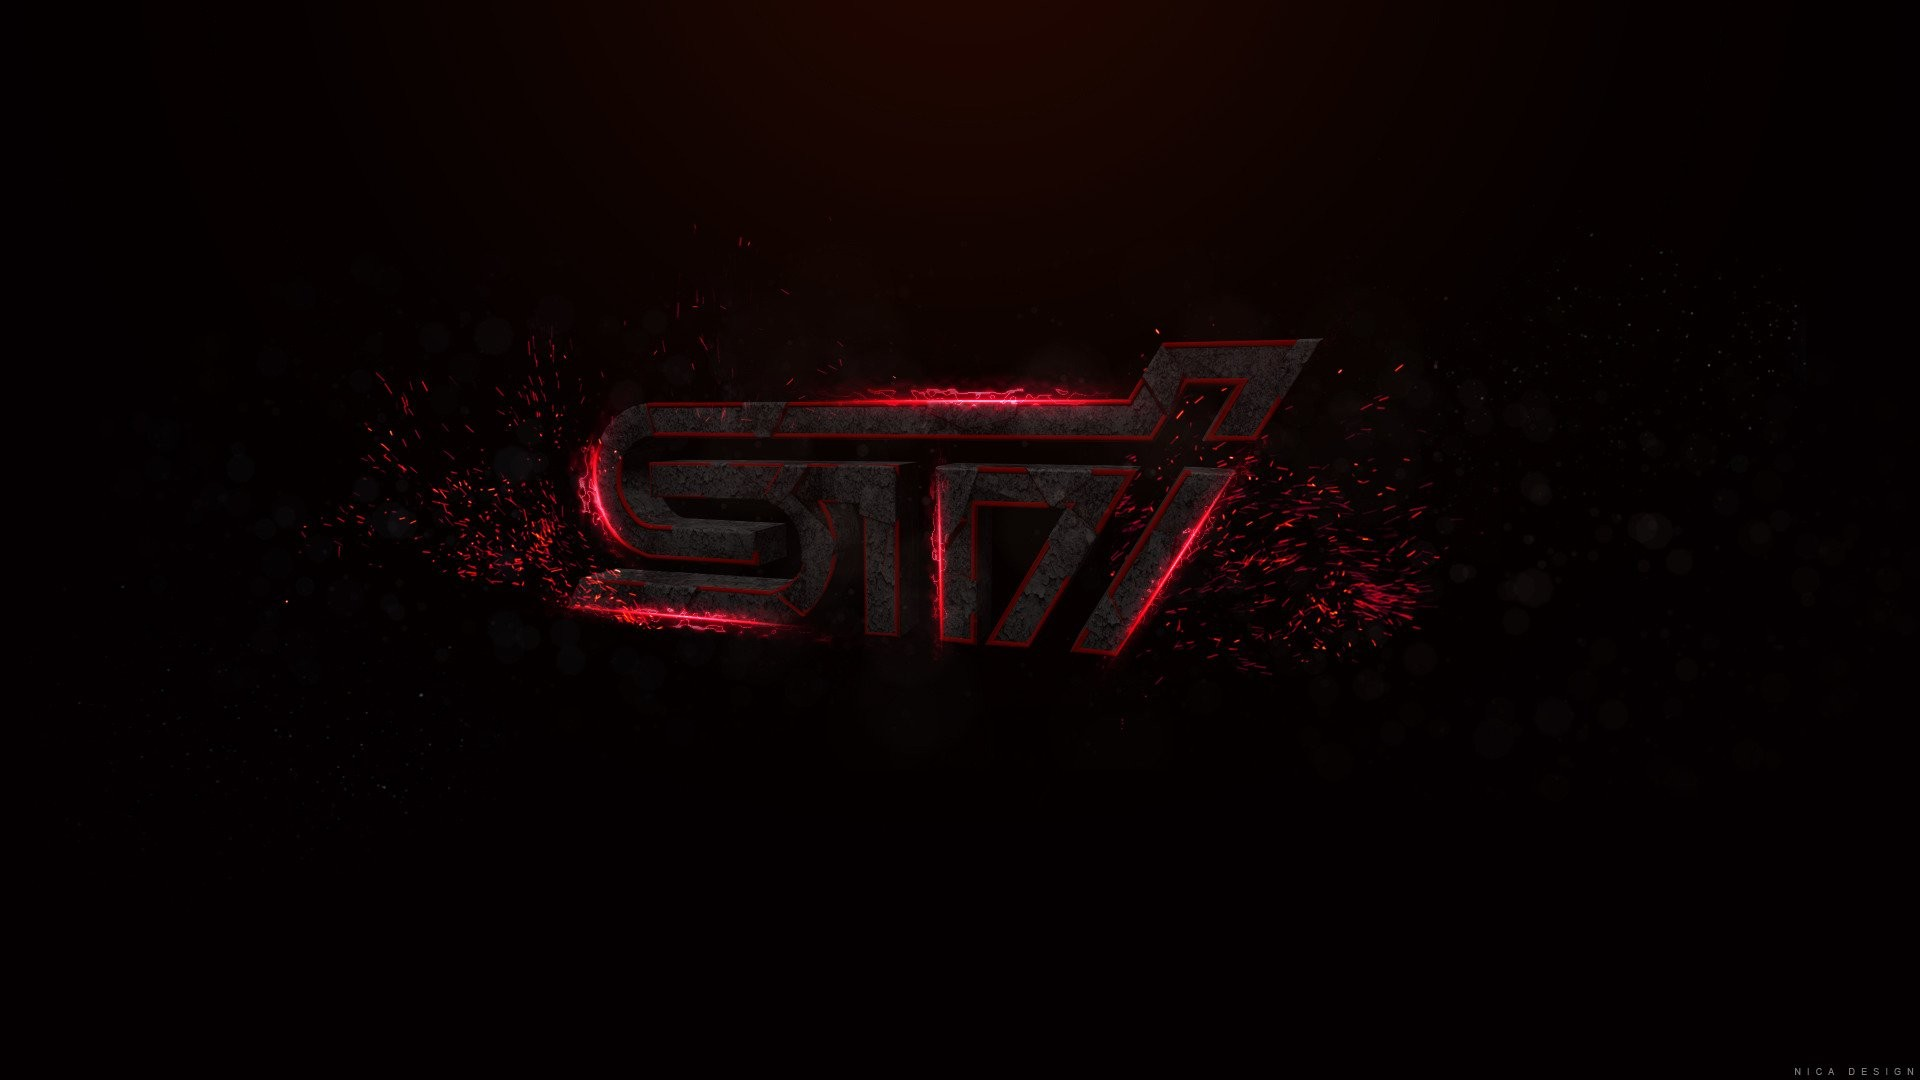 62+ Sti Logo Wallpapers on WallpaperPlay.